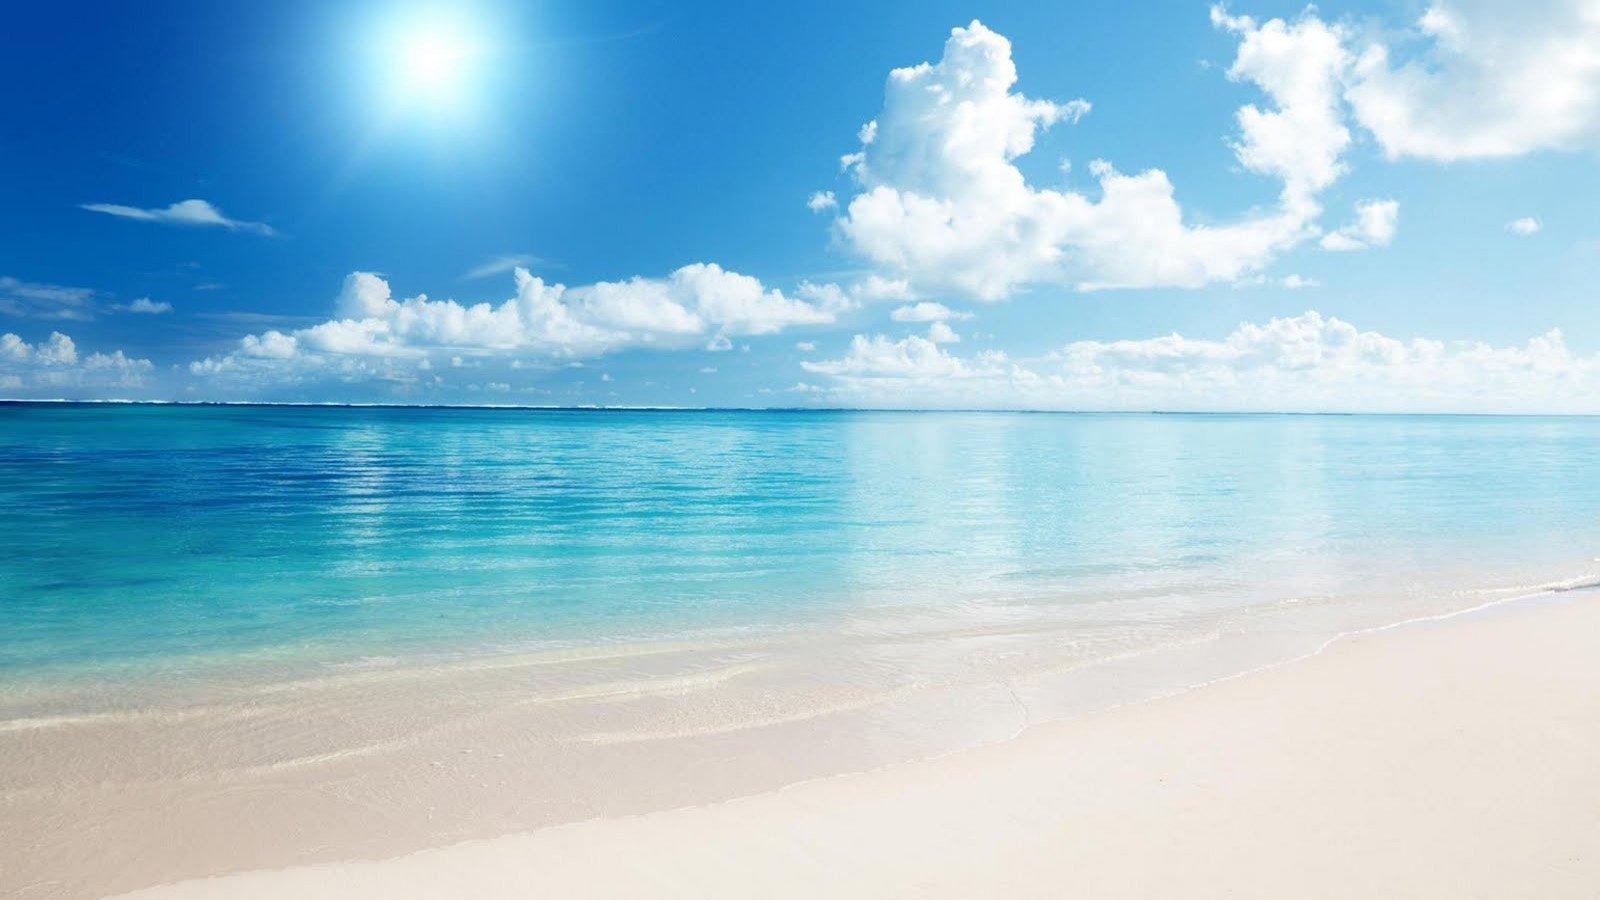 Tropical Island Beach Ambience Sound: Hd Beach Wallpapers